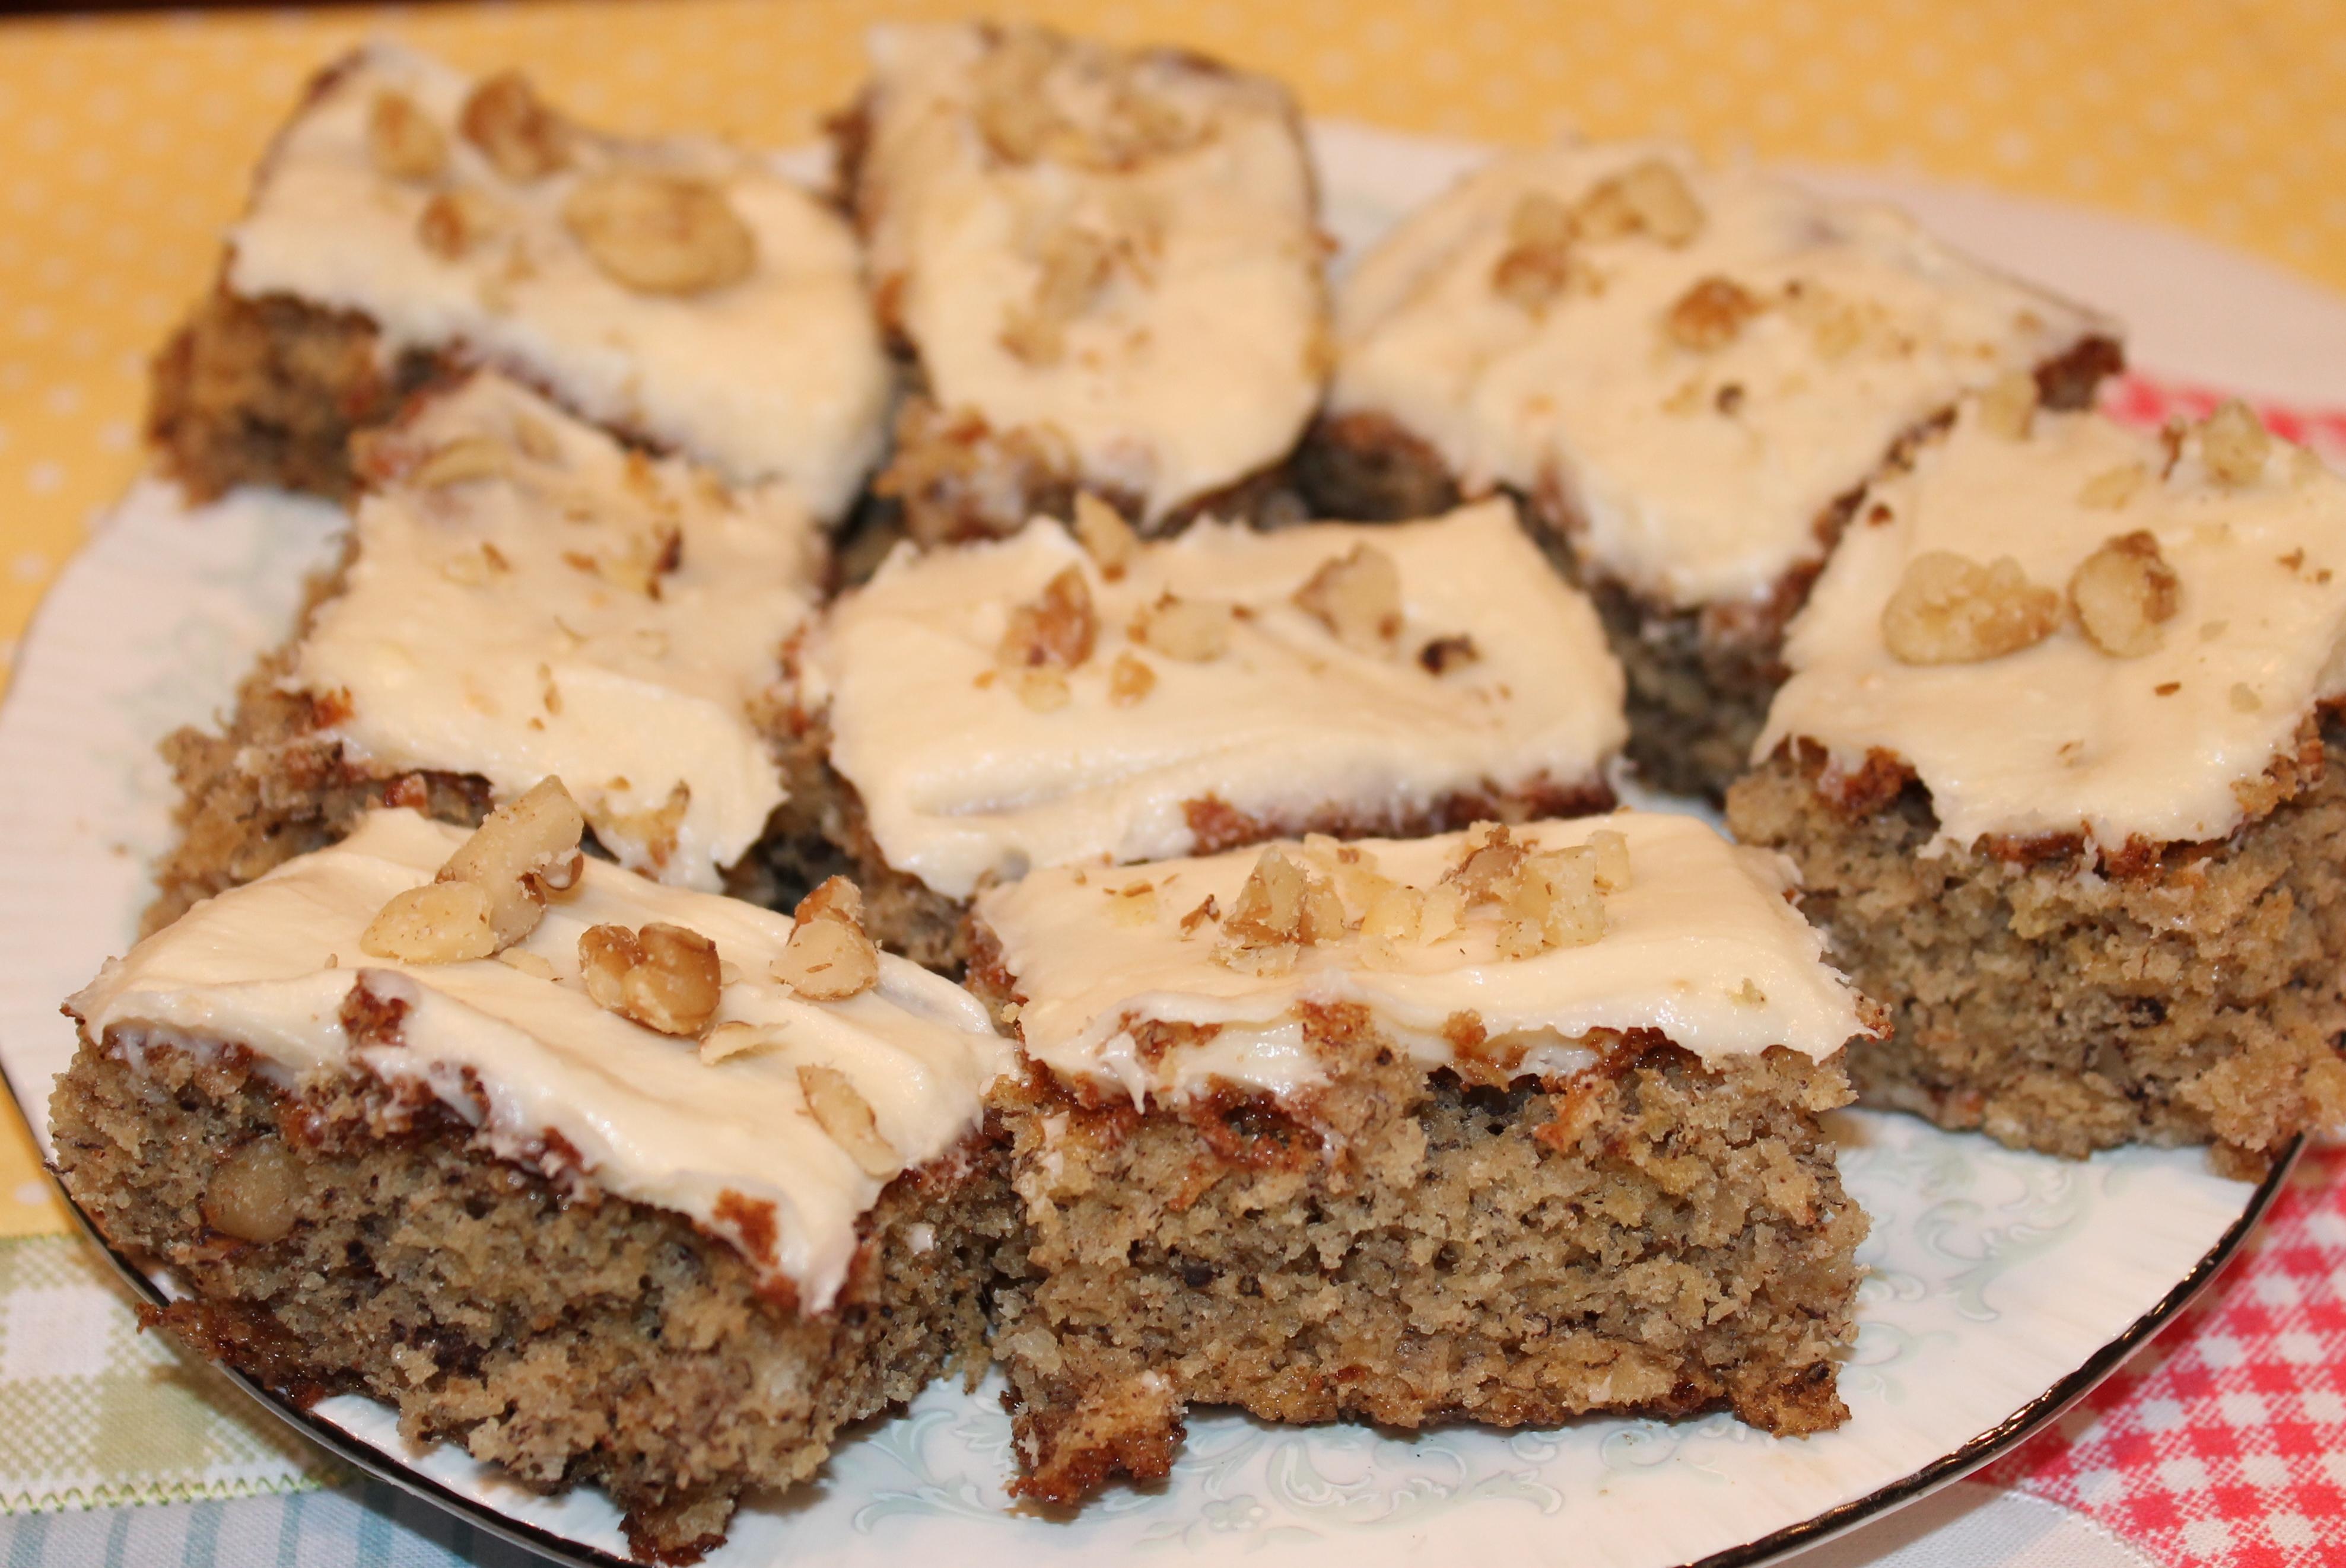 Low Sugar Banana Walnut Cake